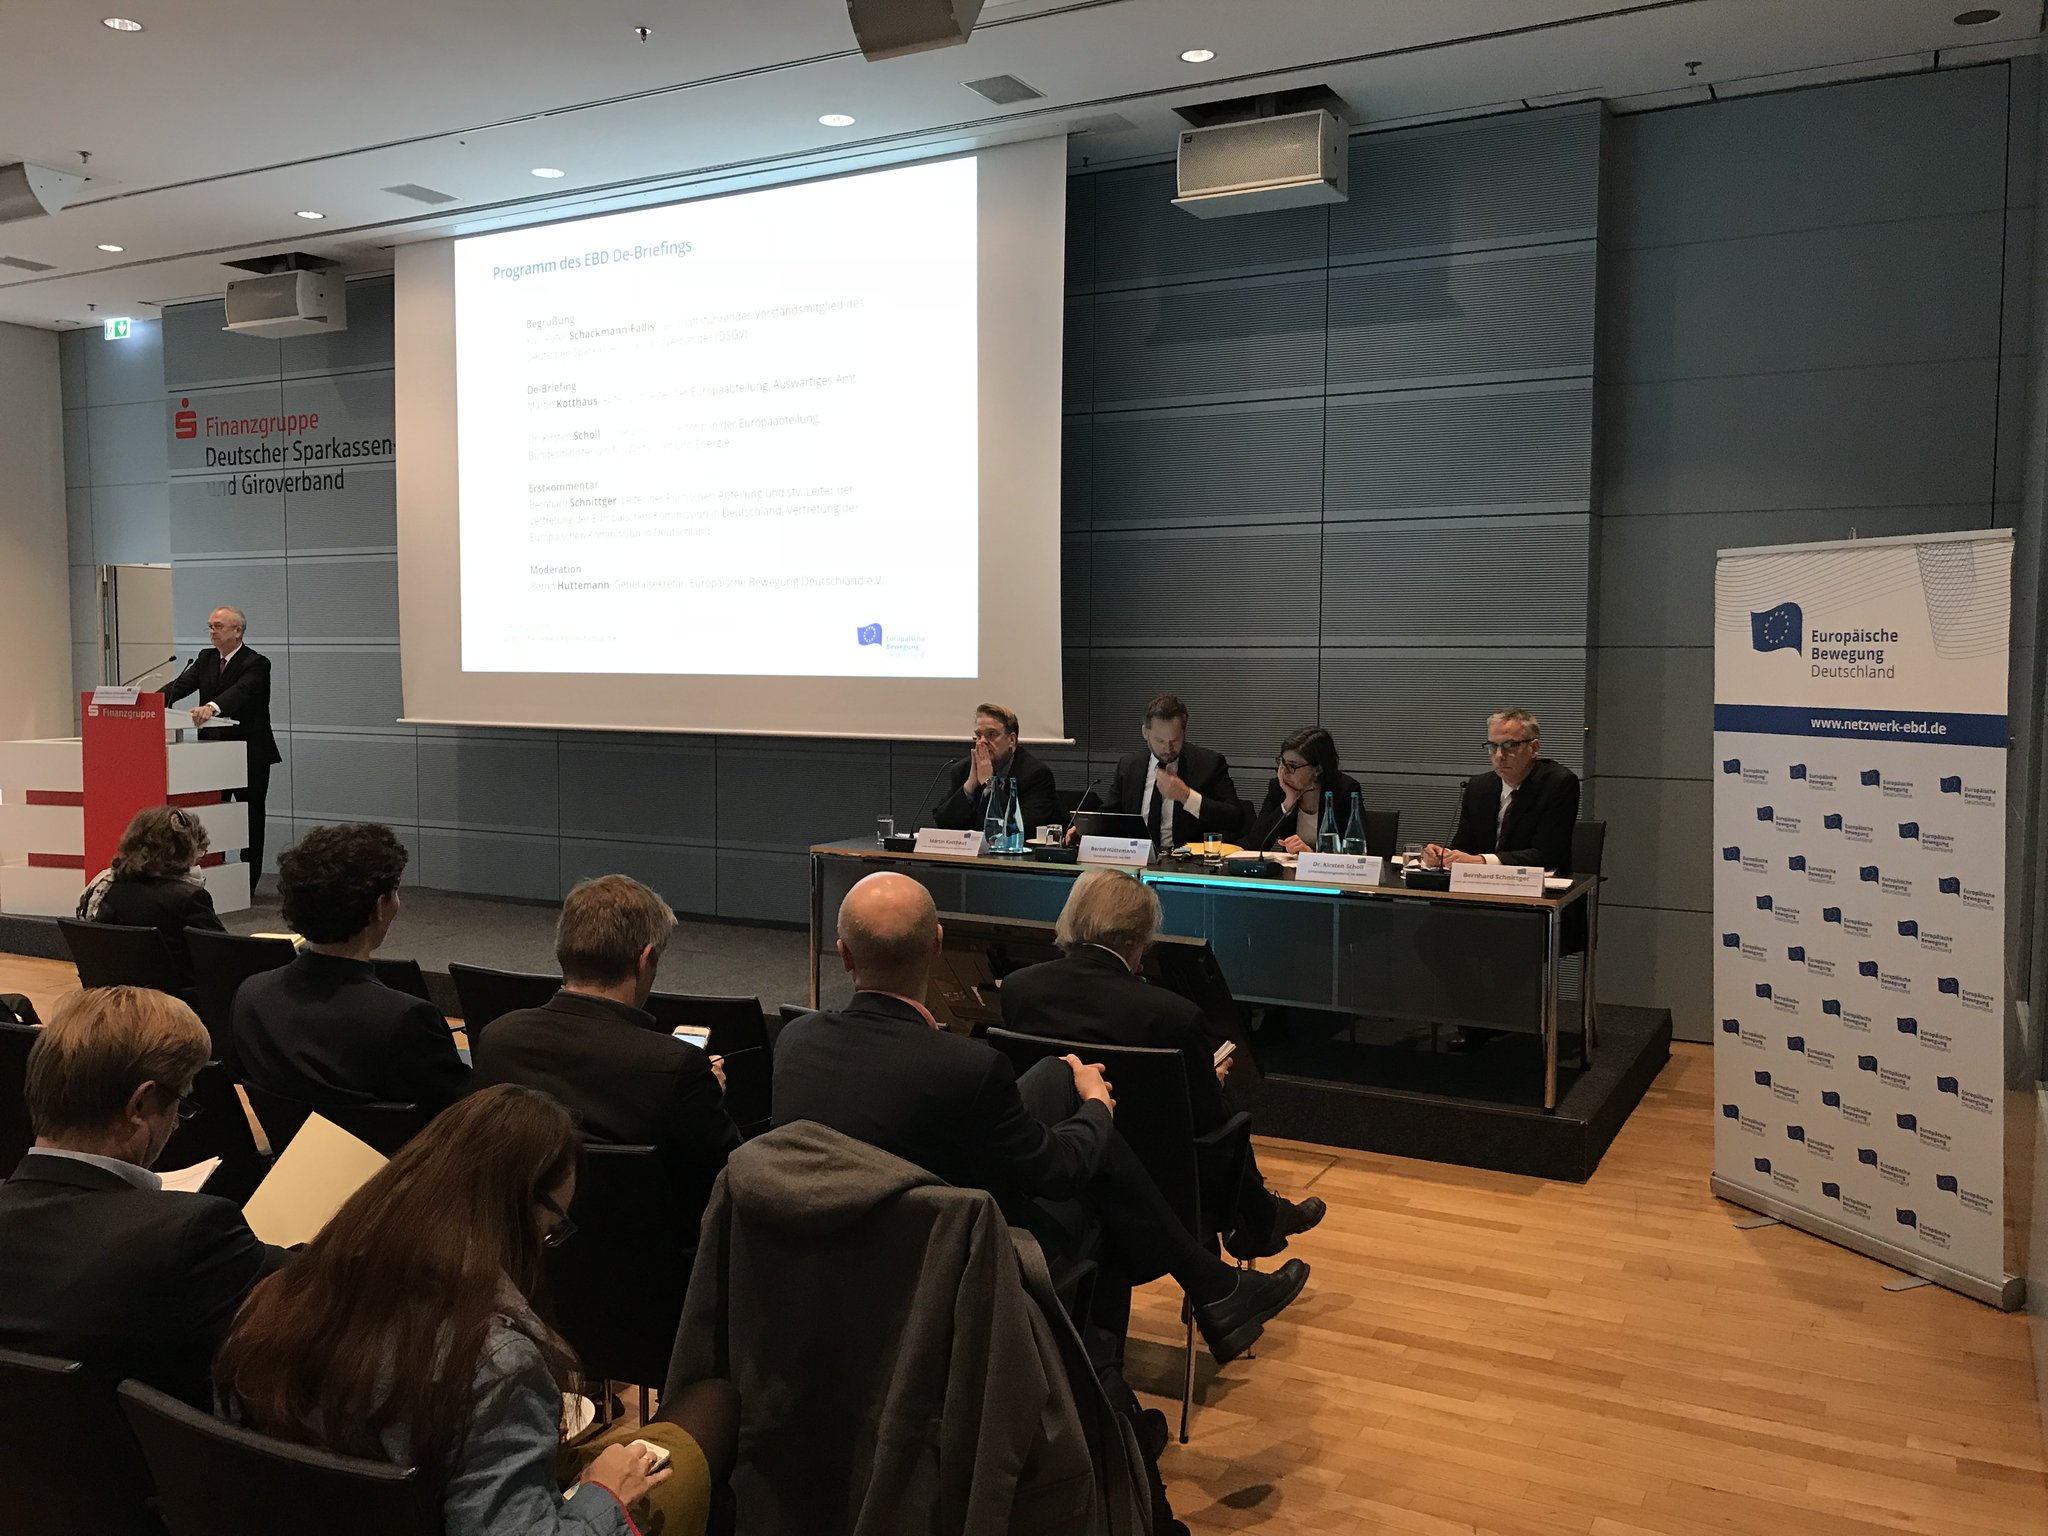 EBD De-Briefing | Europäischer Rat – Ein Hauch weltpolitischer Geschlossenheit